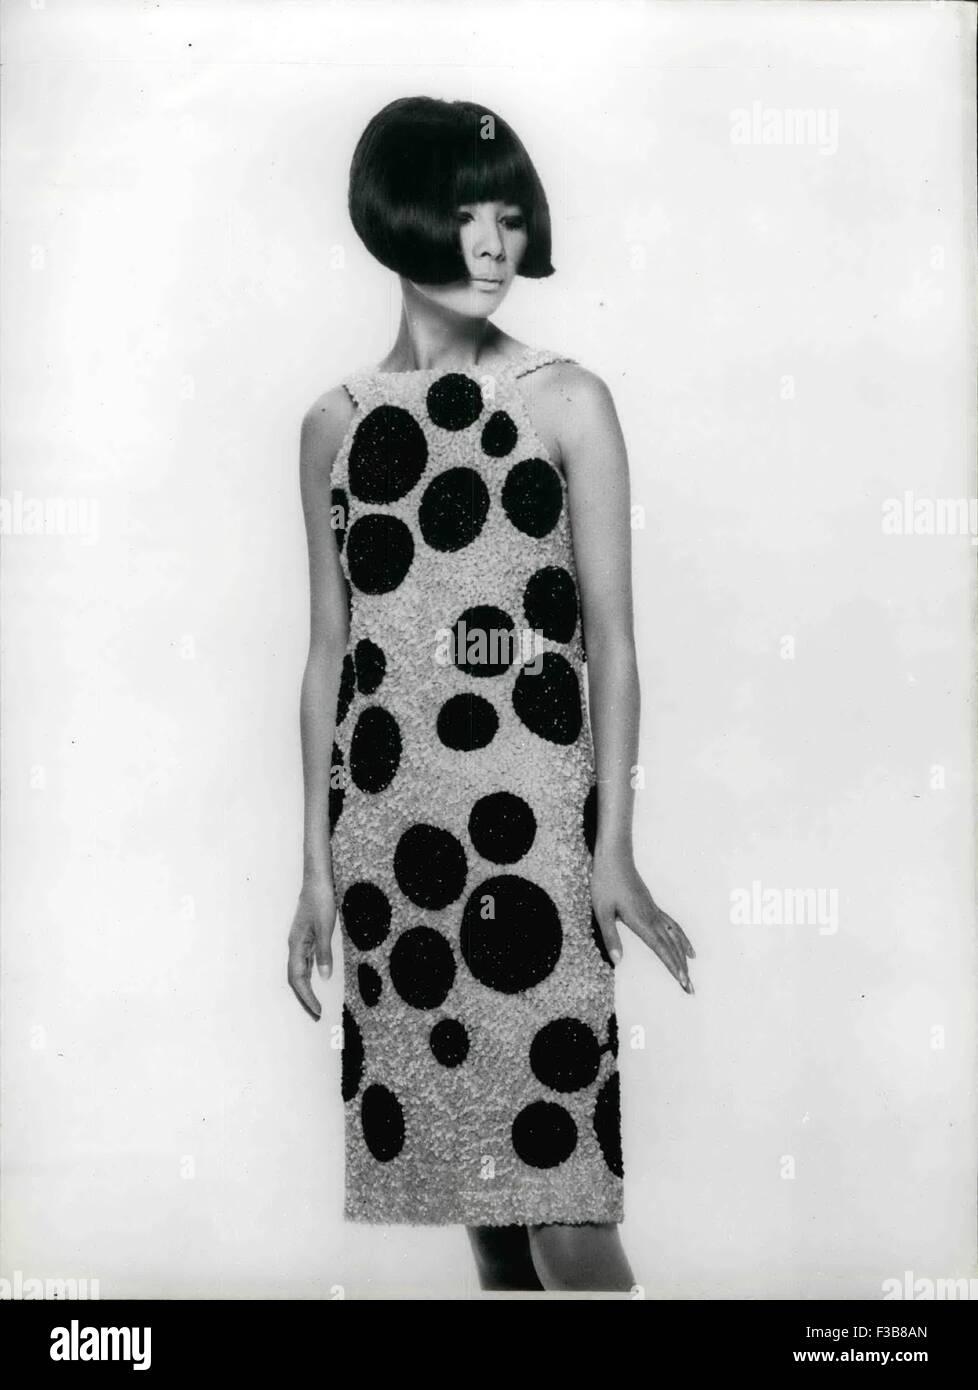 4. Januar 1968 - Herbst und Winter Mode Ops: Cocktail-Kleid, rosa ...